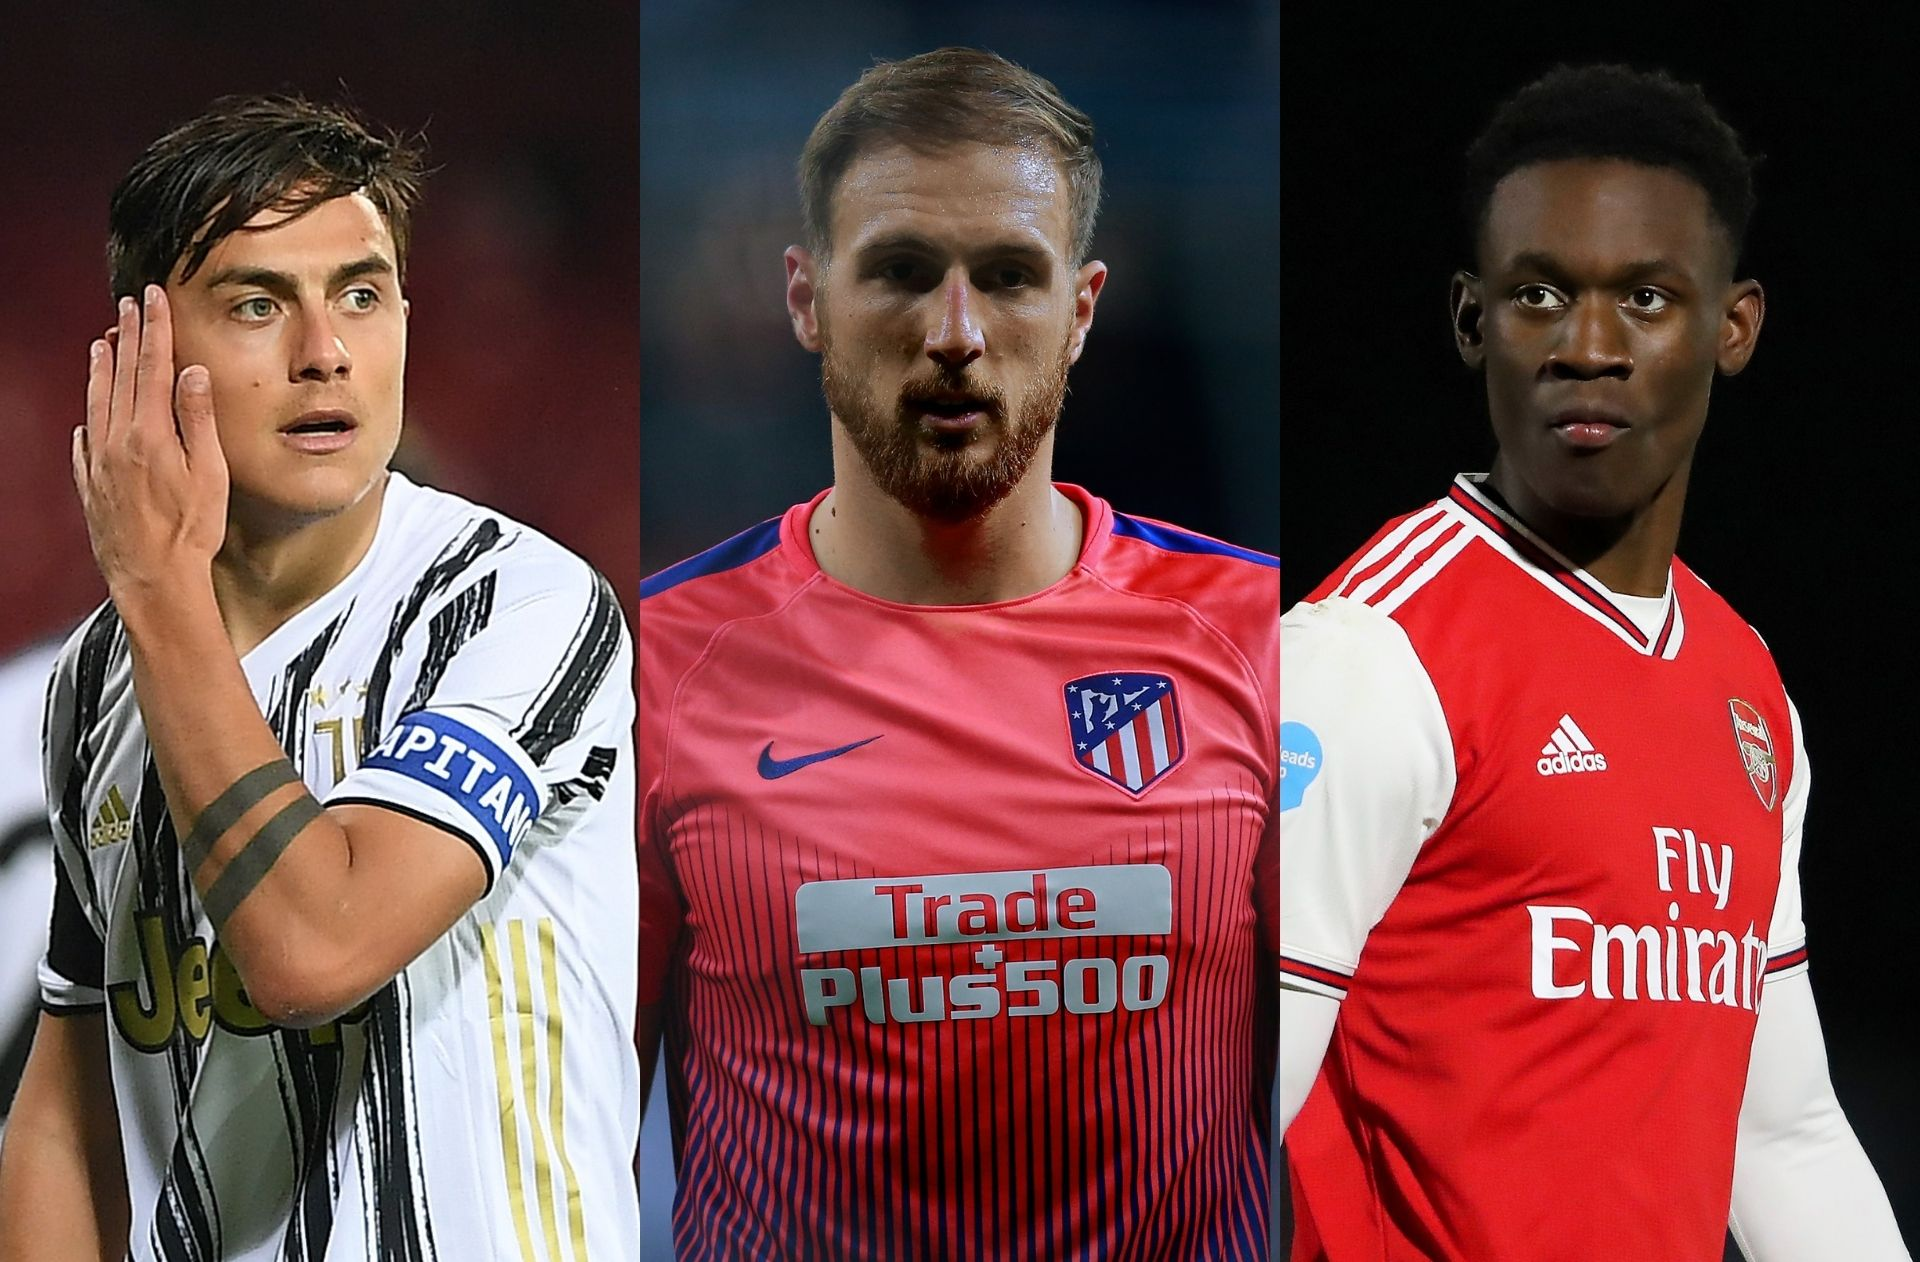 Saturday's transfer rumors - Oblak 'ready' for Premier League move